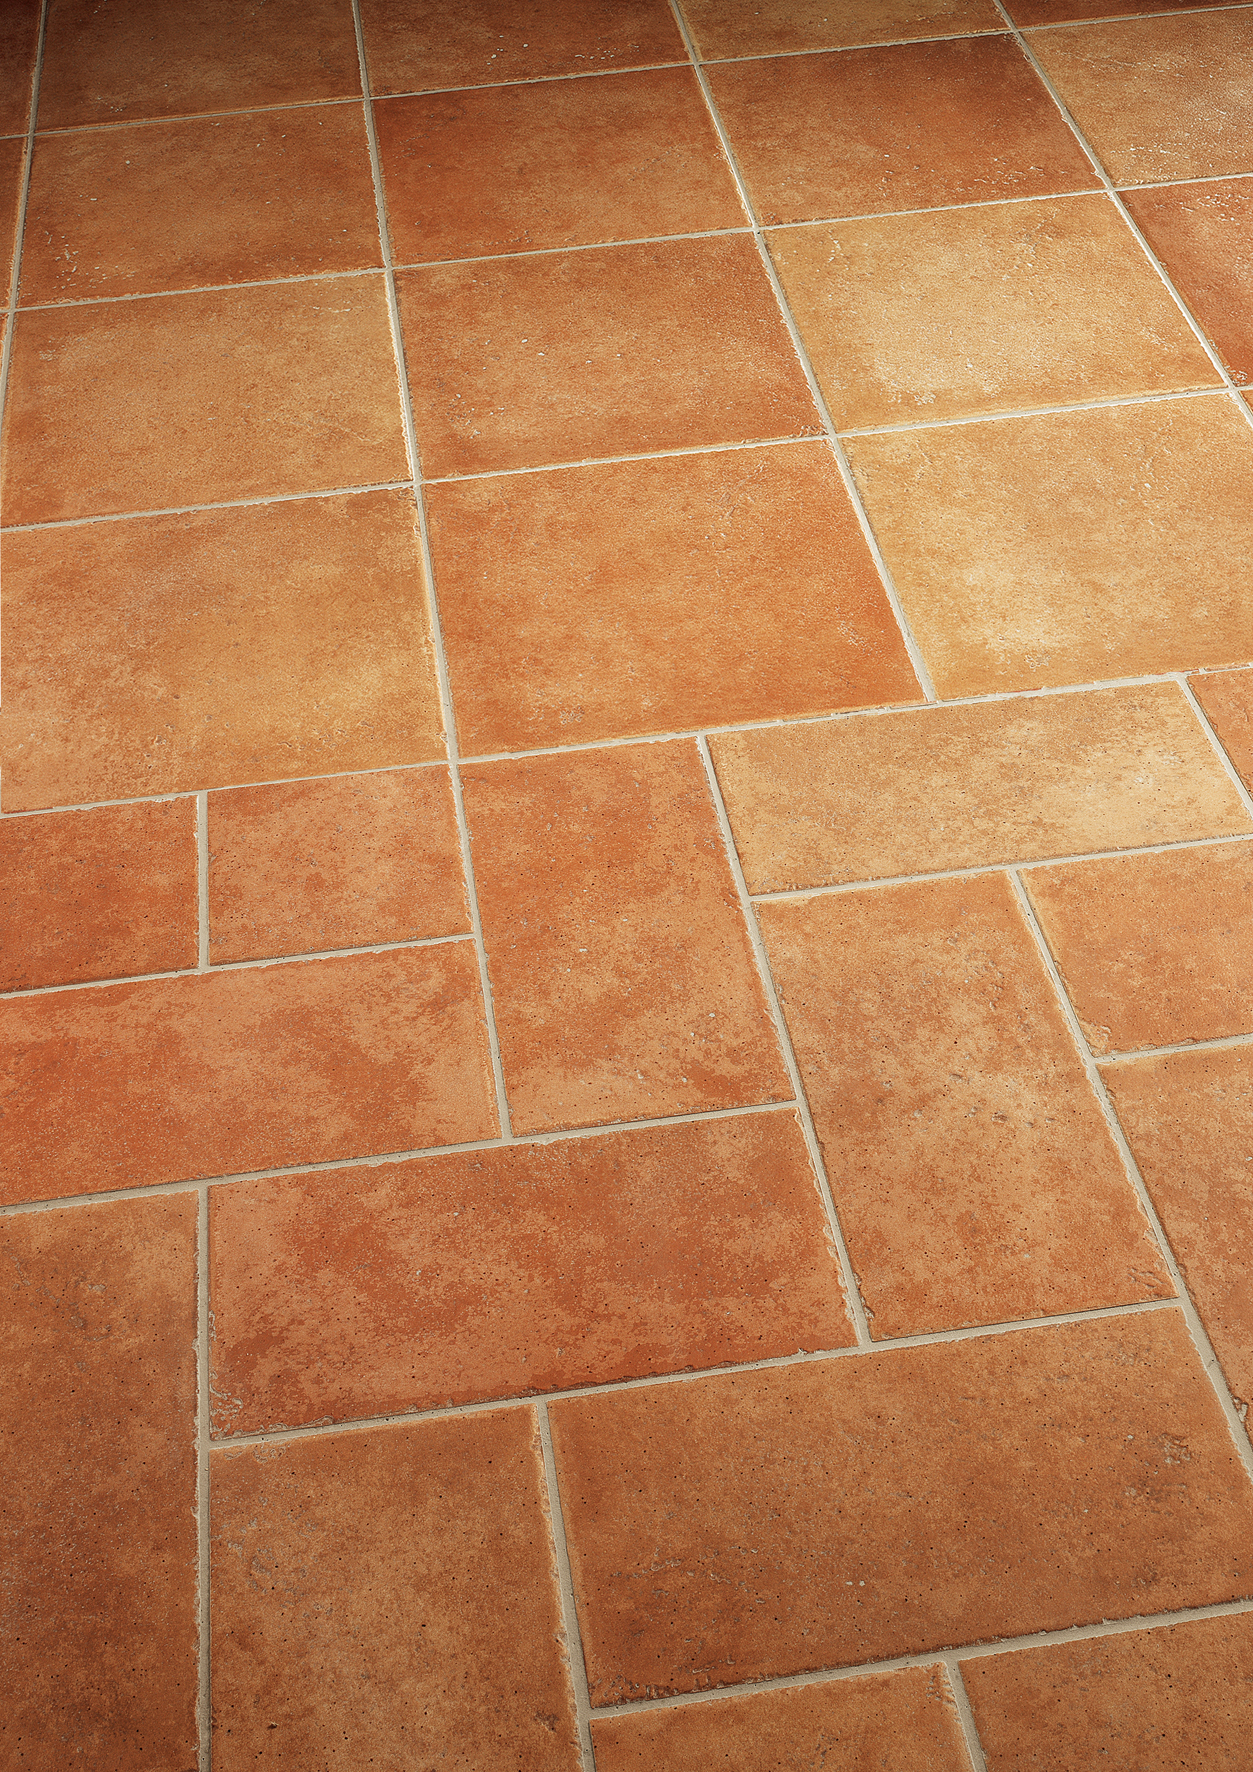 Carrelage saime serie cotto nobile 30x30 1 choix for Carrelage 30x30 beige